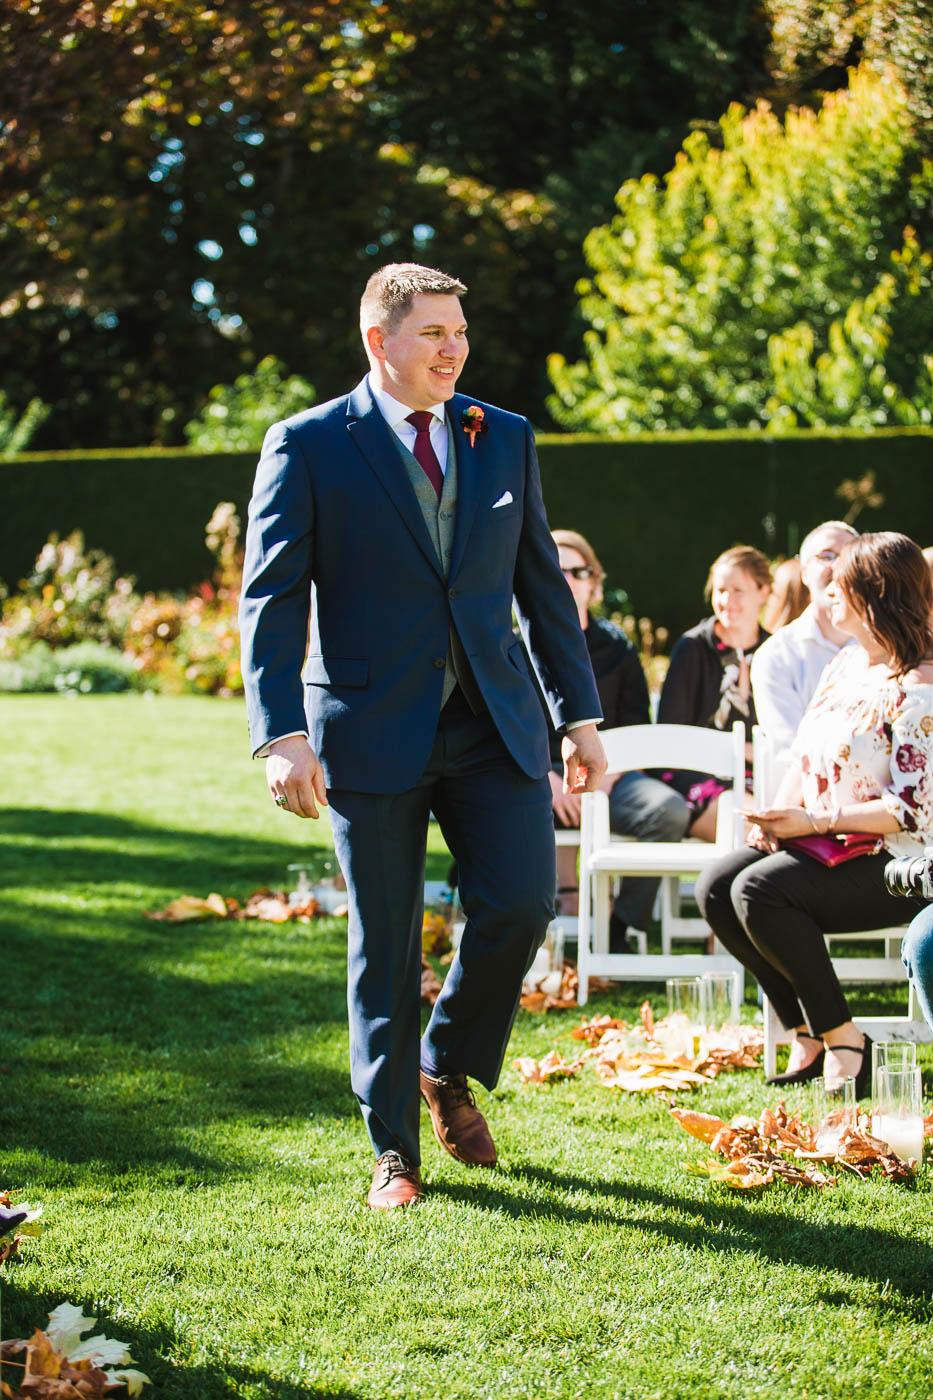 groom Victoria BC Wedding Photography - Hatley Castle Wedding Photography - Bear Mountain Wedding Photography